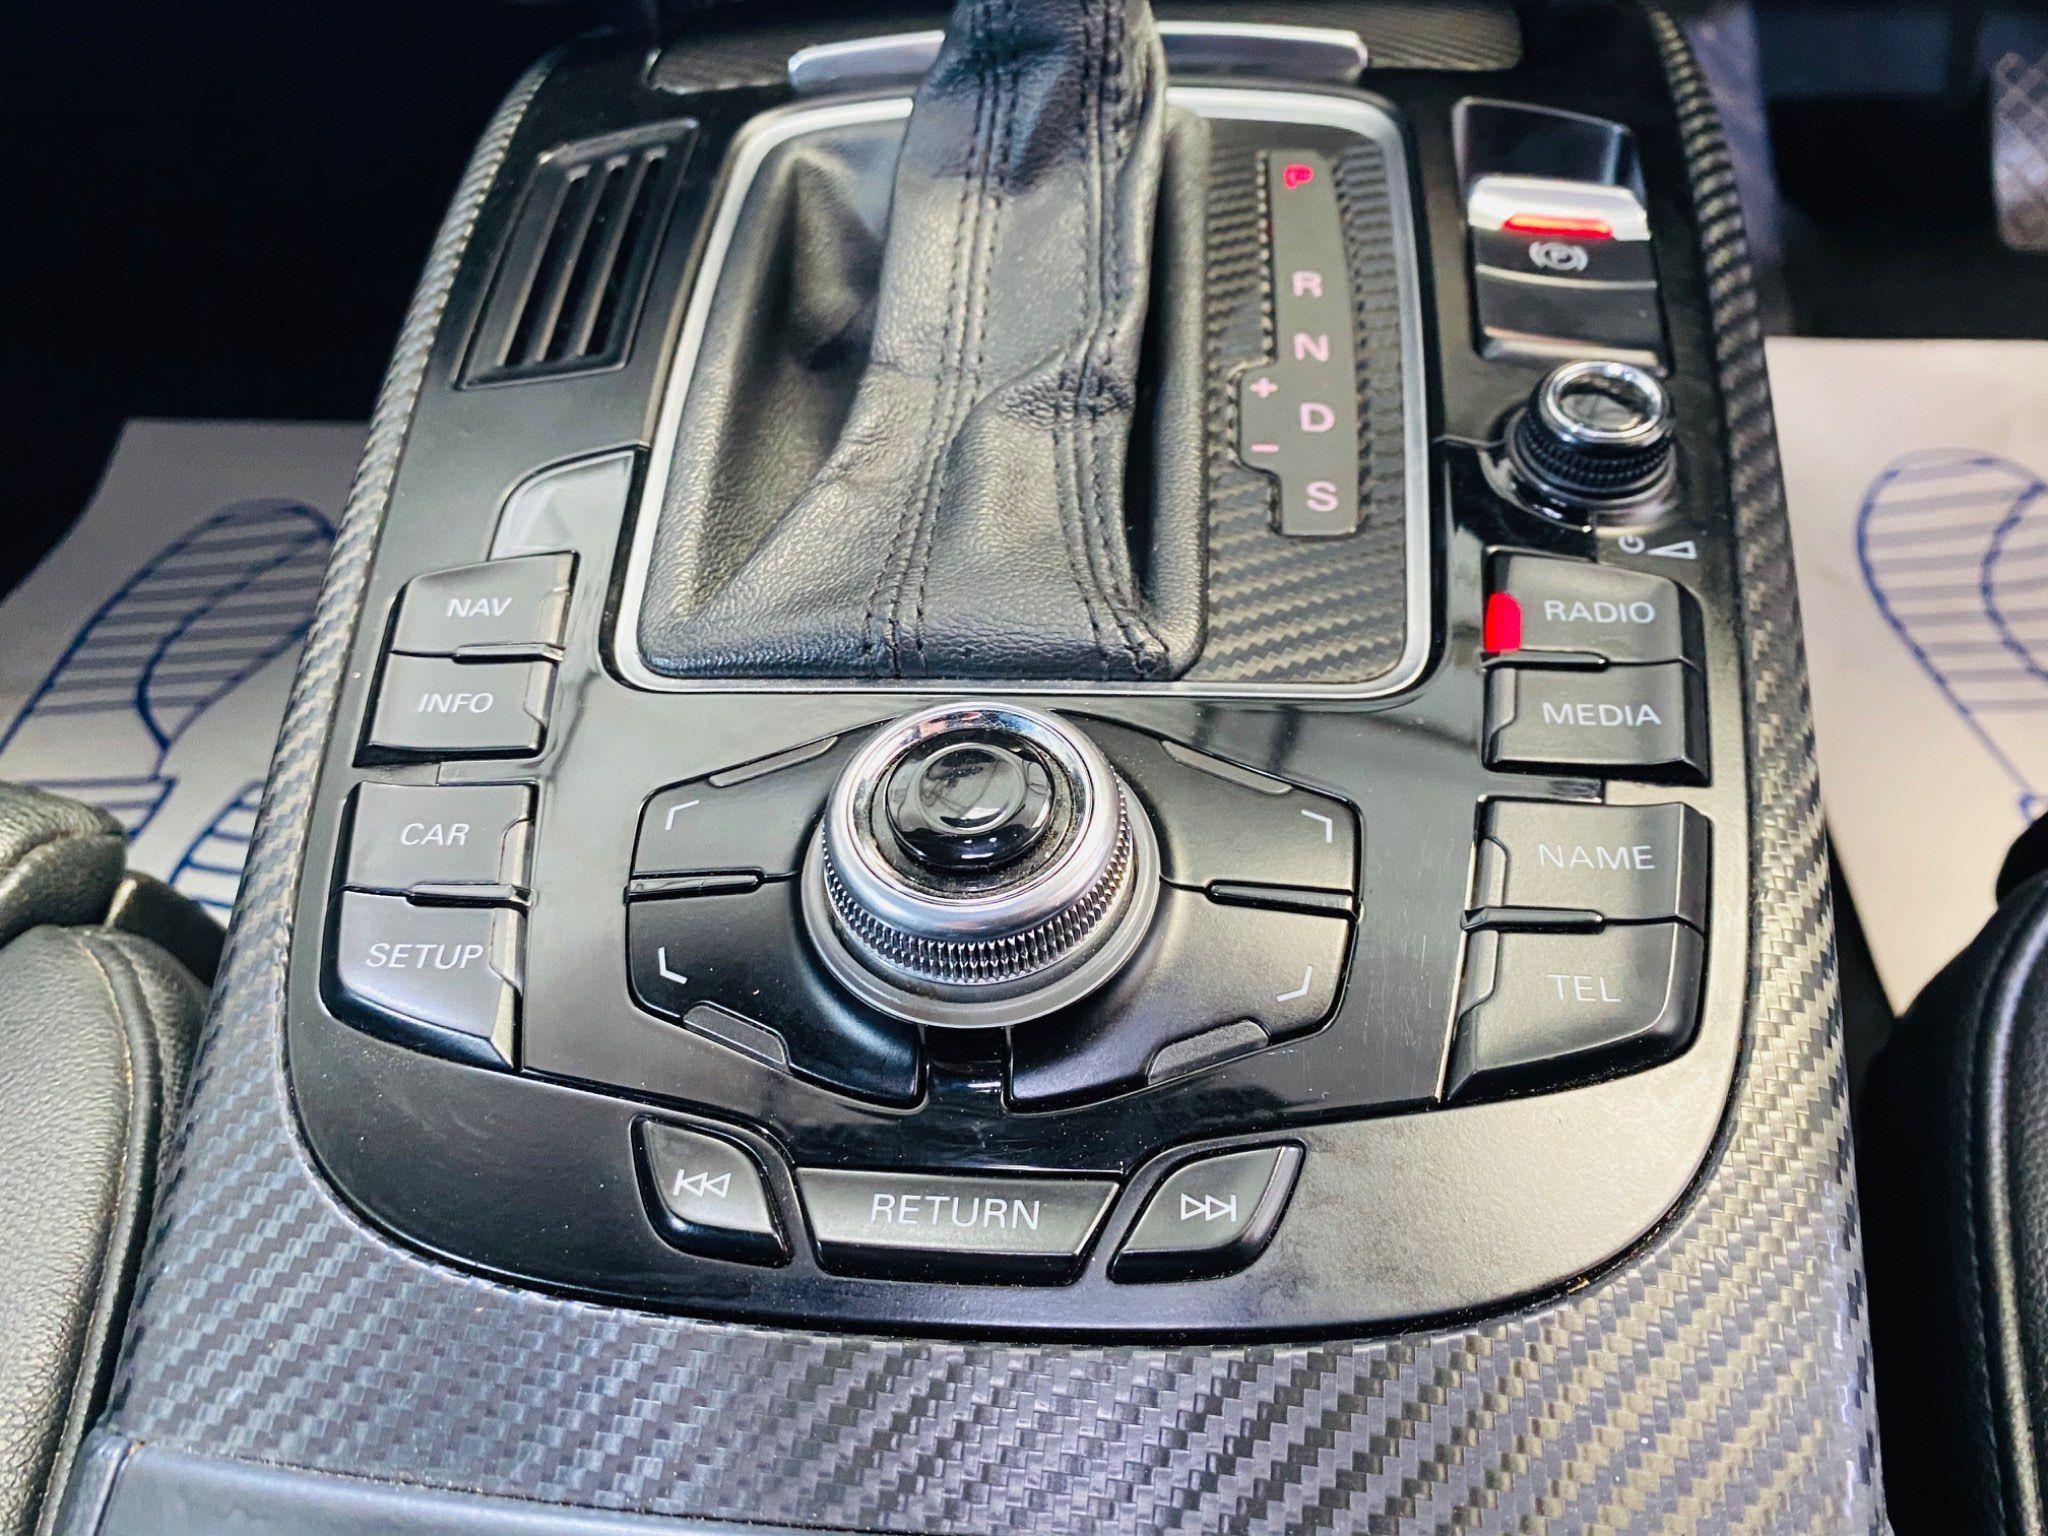 Audi A5 3.0 TDI S line S Tronic quattro 2dr full